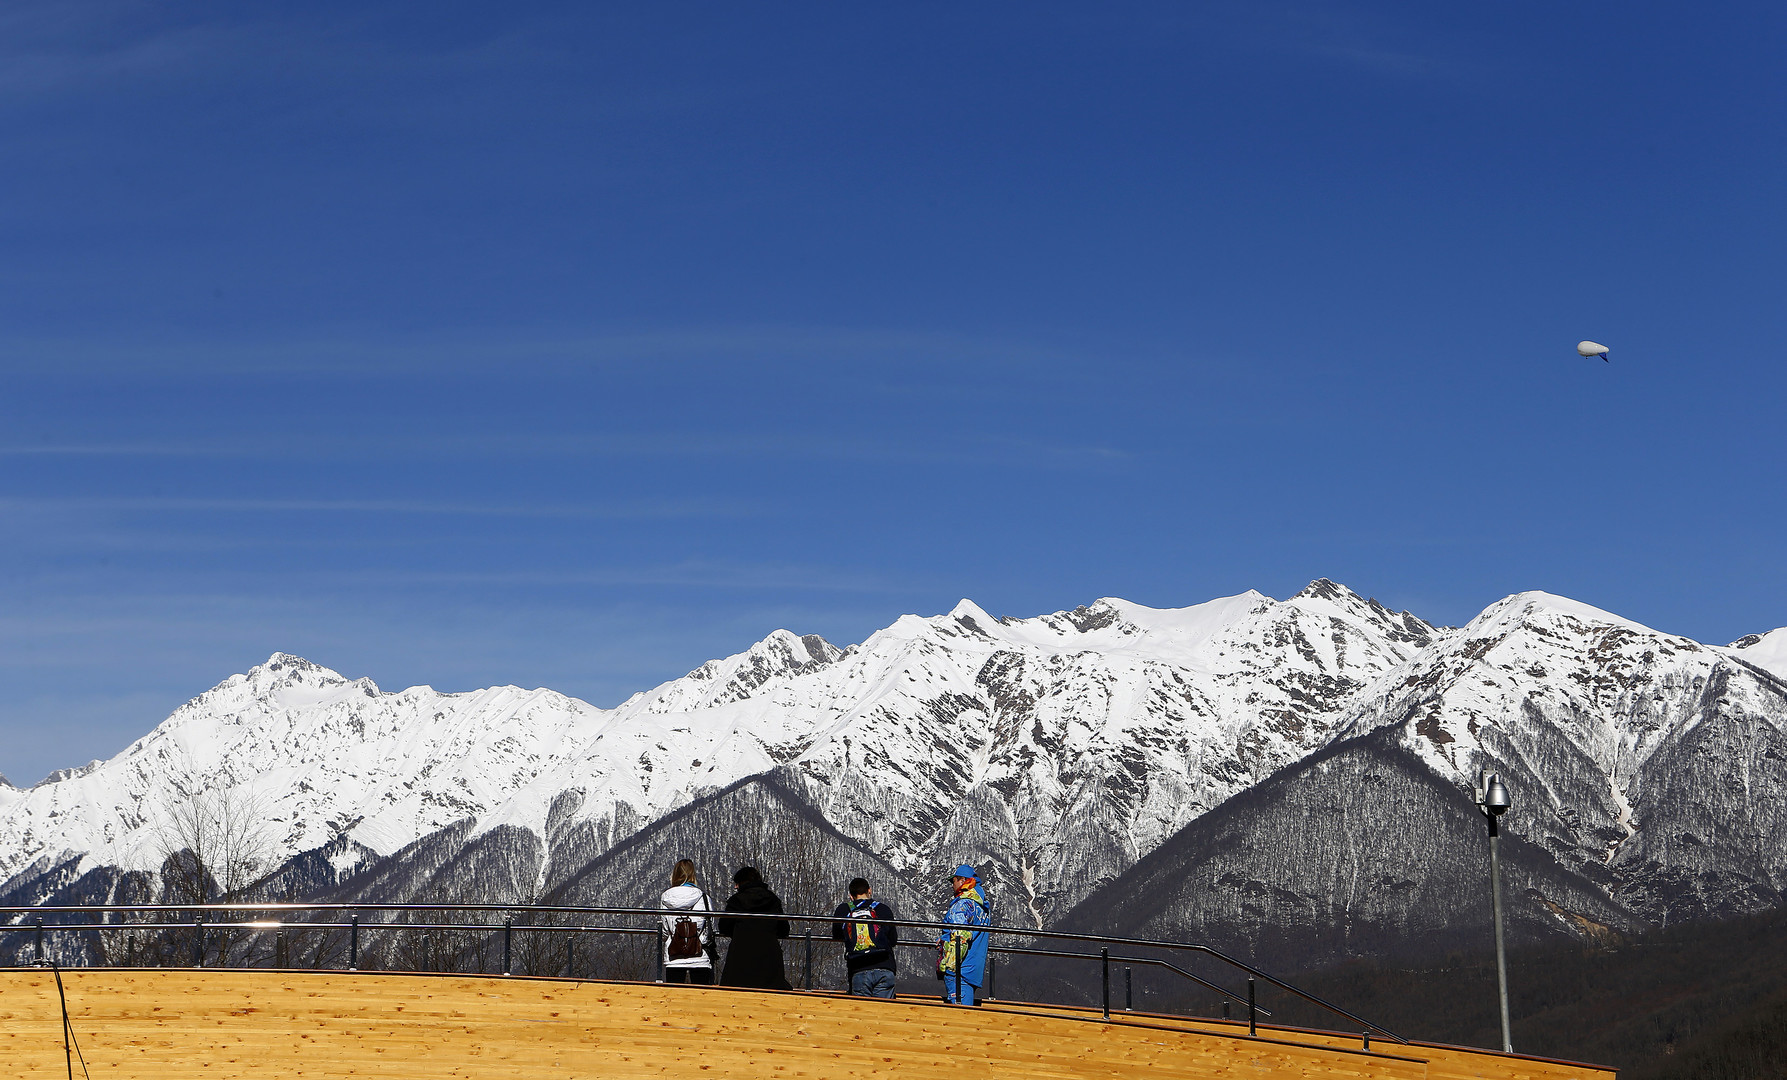 Ausblick vom Sanki Sliding Center in Rosa Khutor, bei Sochi.